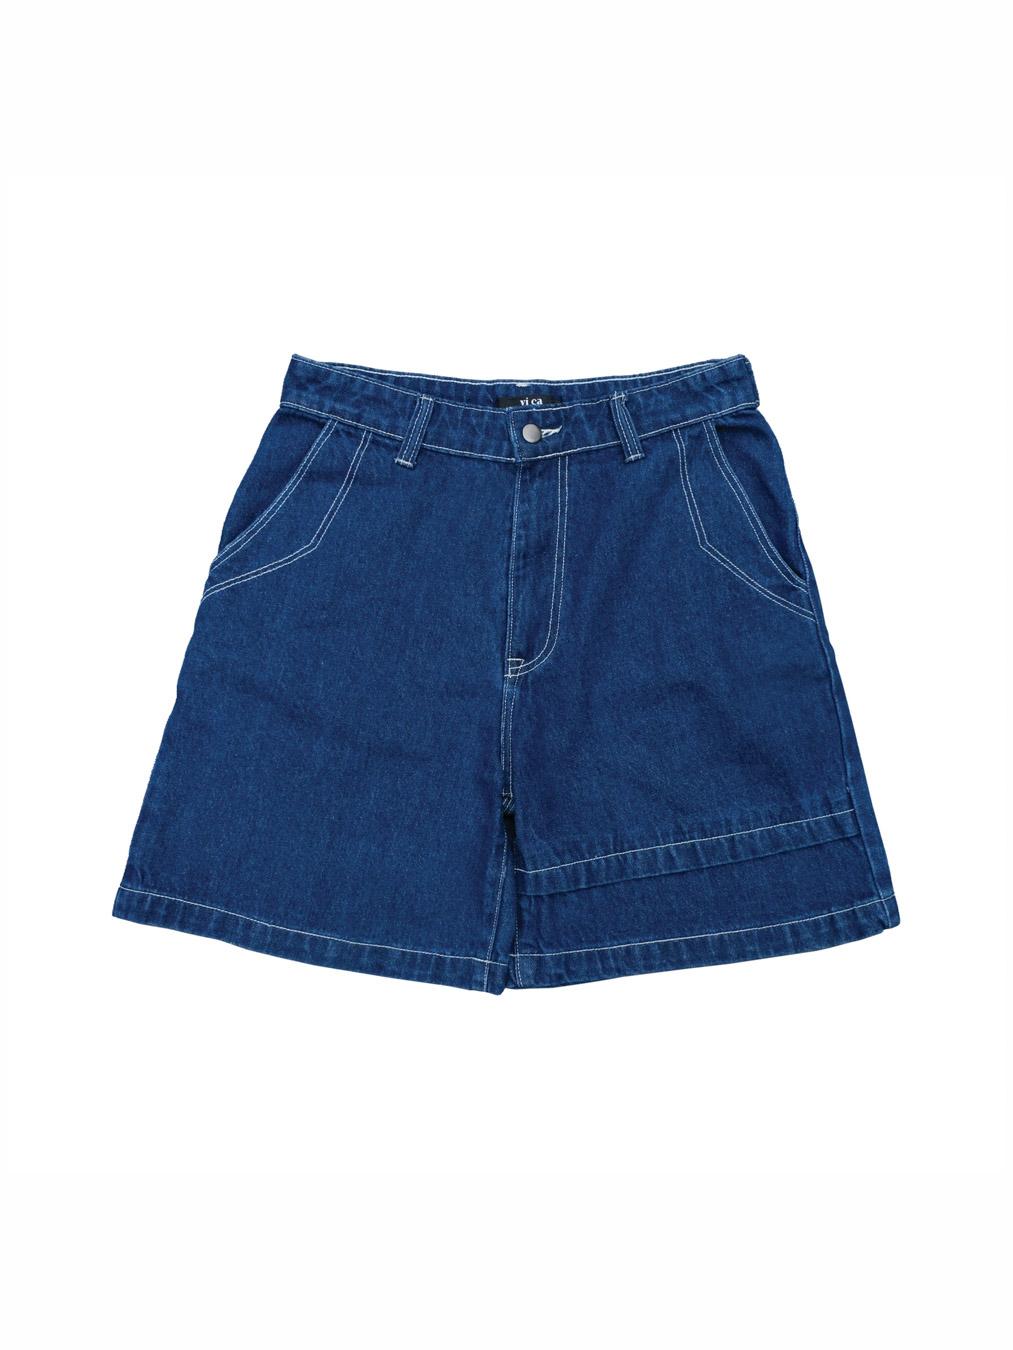 Vineca Denim Shorts